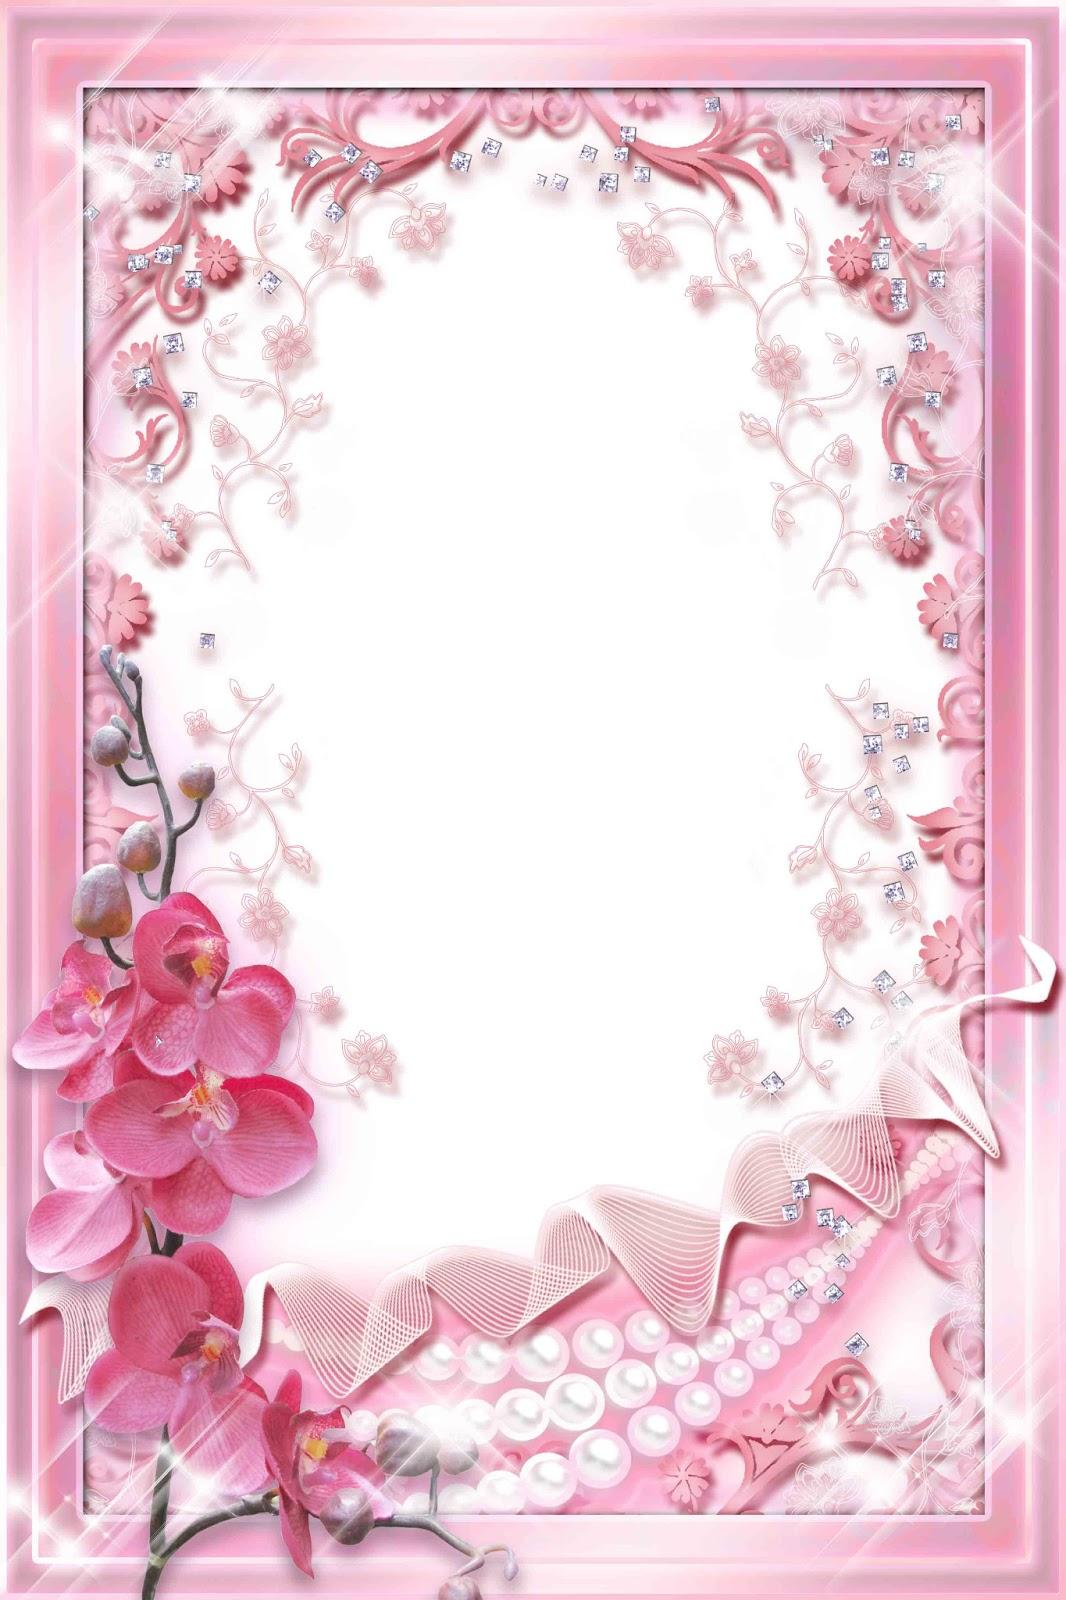 pink frame psd | psd frame